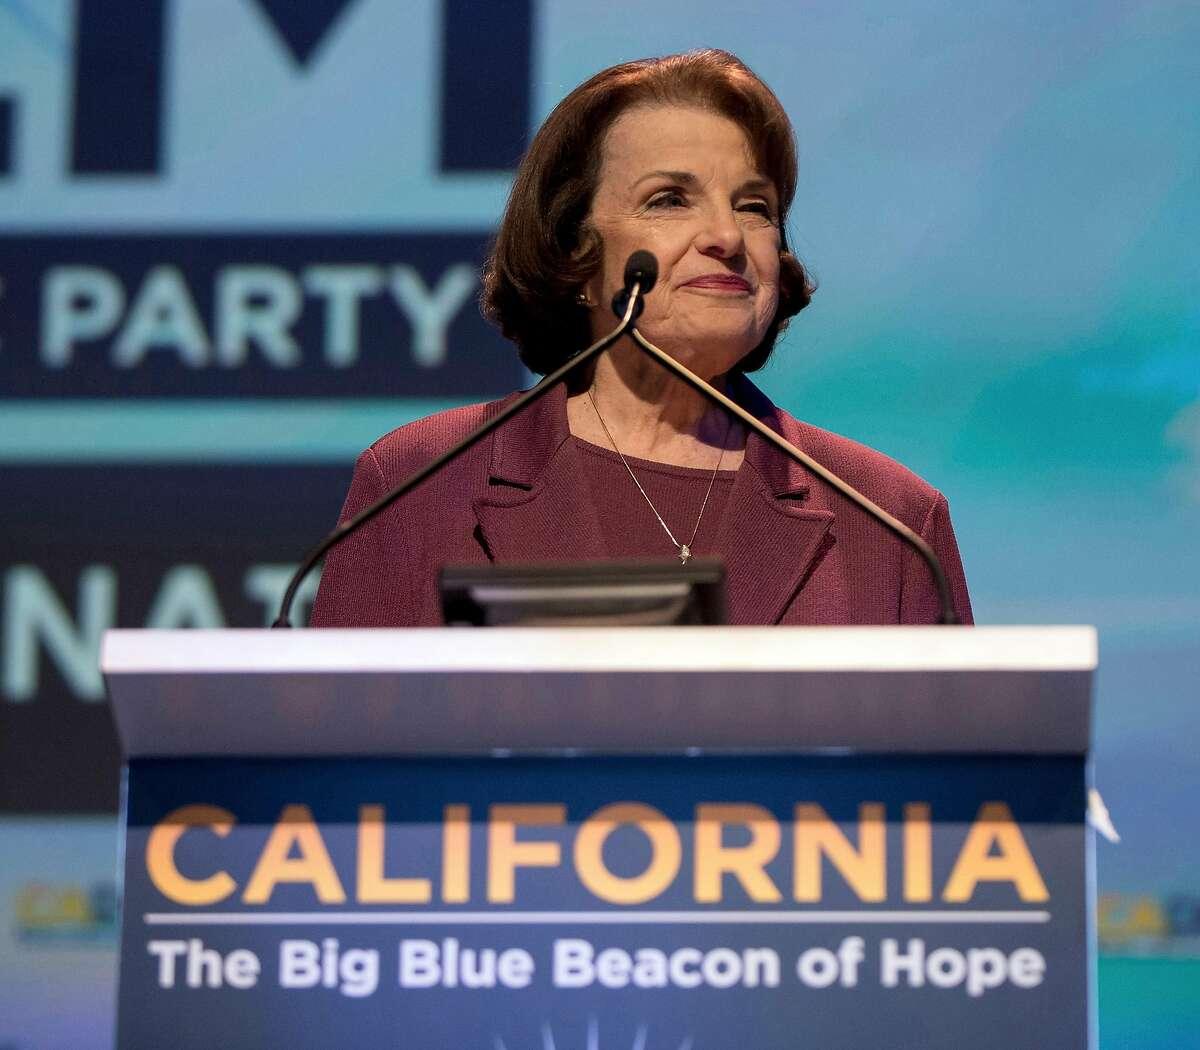 U.S. Sen. Dianne Feinstein (D-Calif.) addresses the 2018 California Democrats State Convention on February 24, 2018, in San Diego. (Brian Cahn/Zuma Press/TNS)